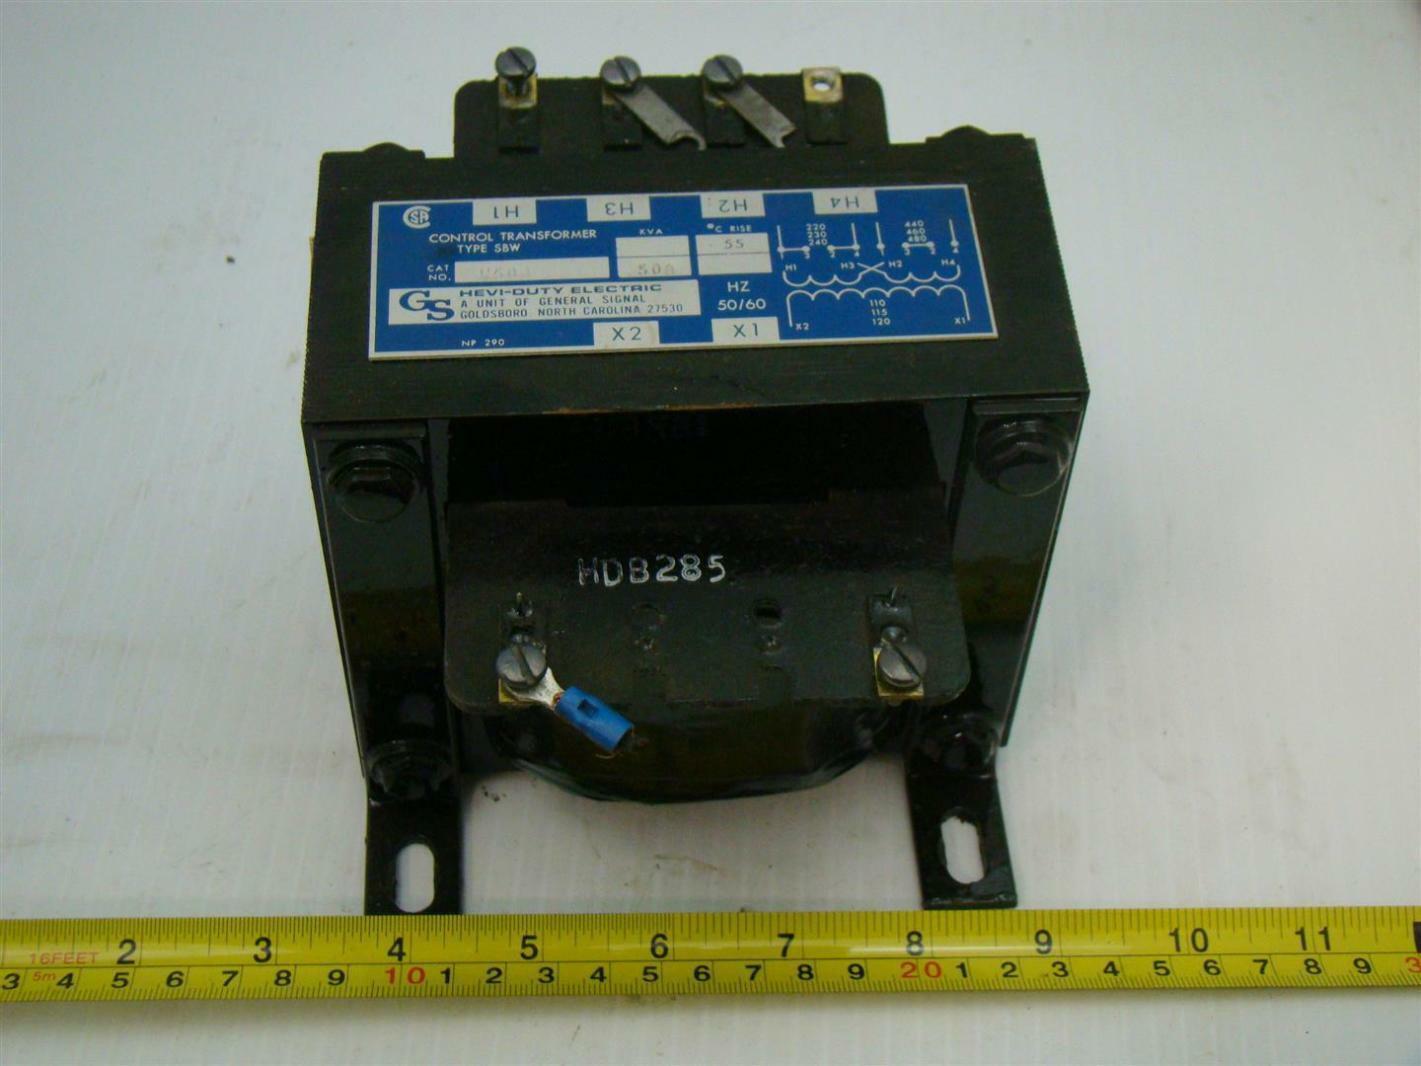 Hevi Duty Electric Transformer 500kva 220 440v W500 Ebay